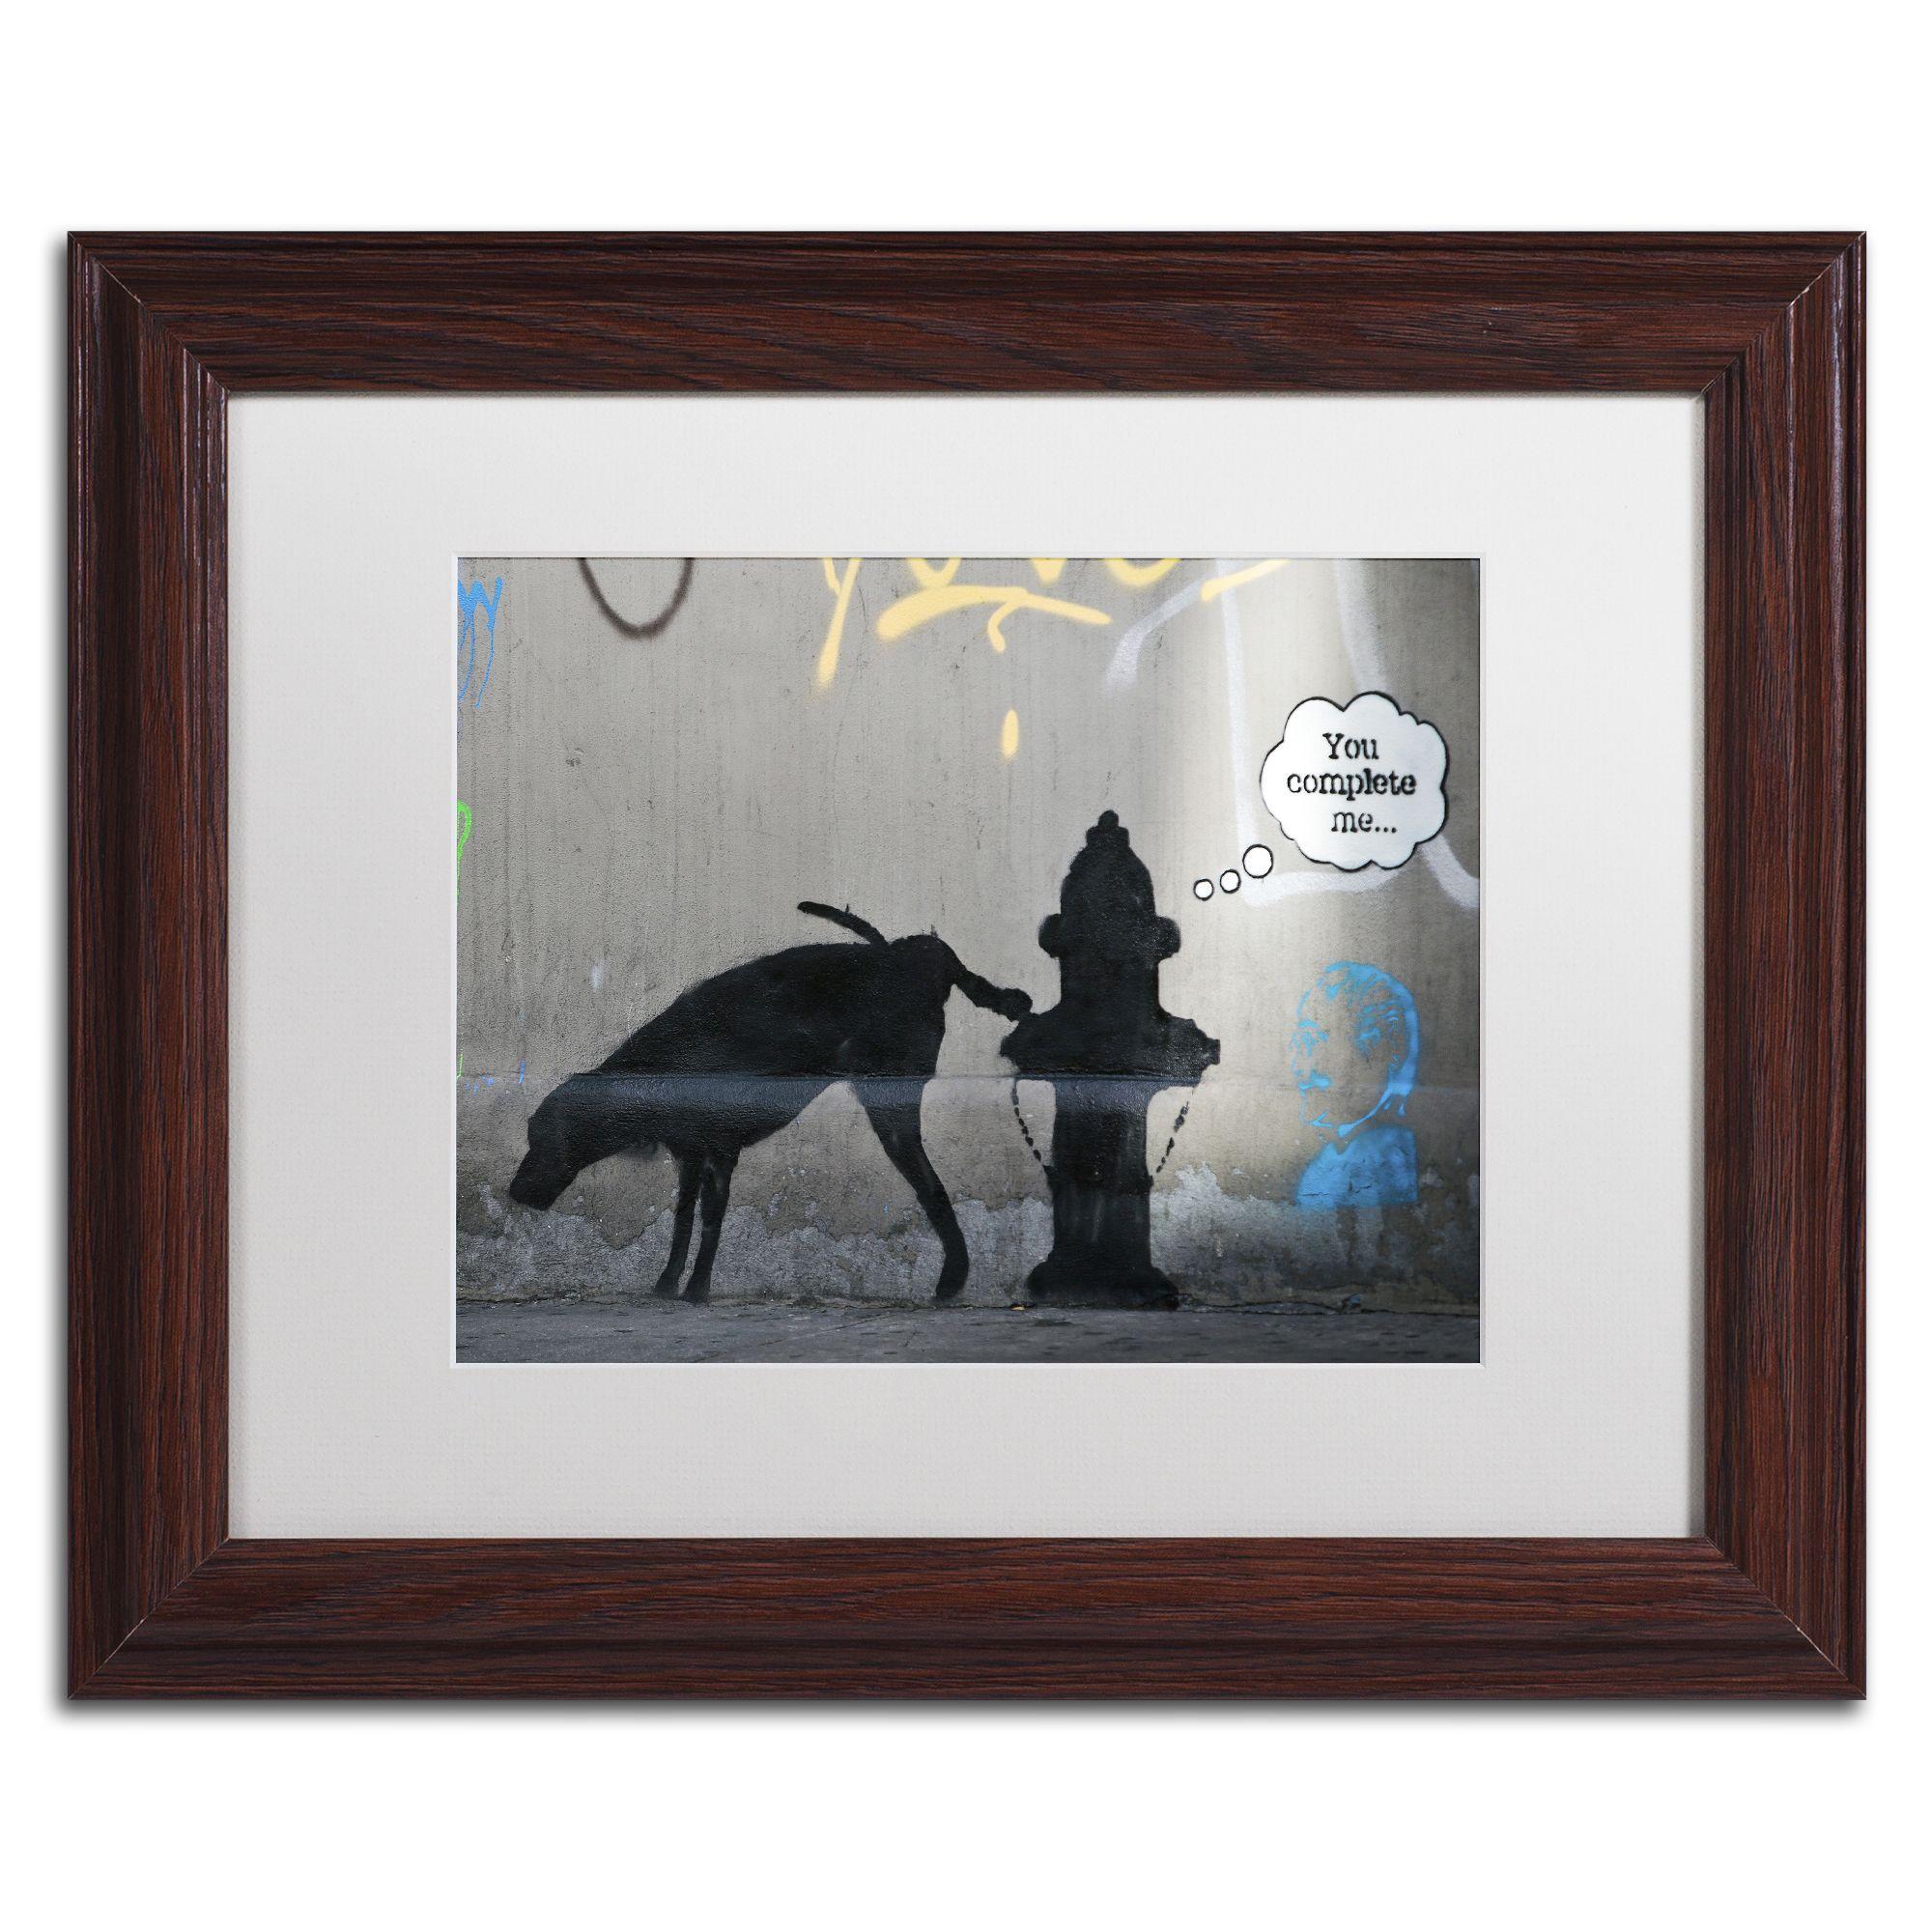 Banksy uyou complete meu matte wood framed wall art products